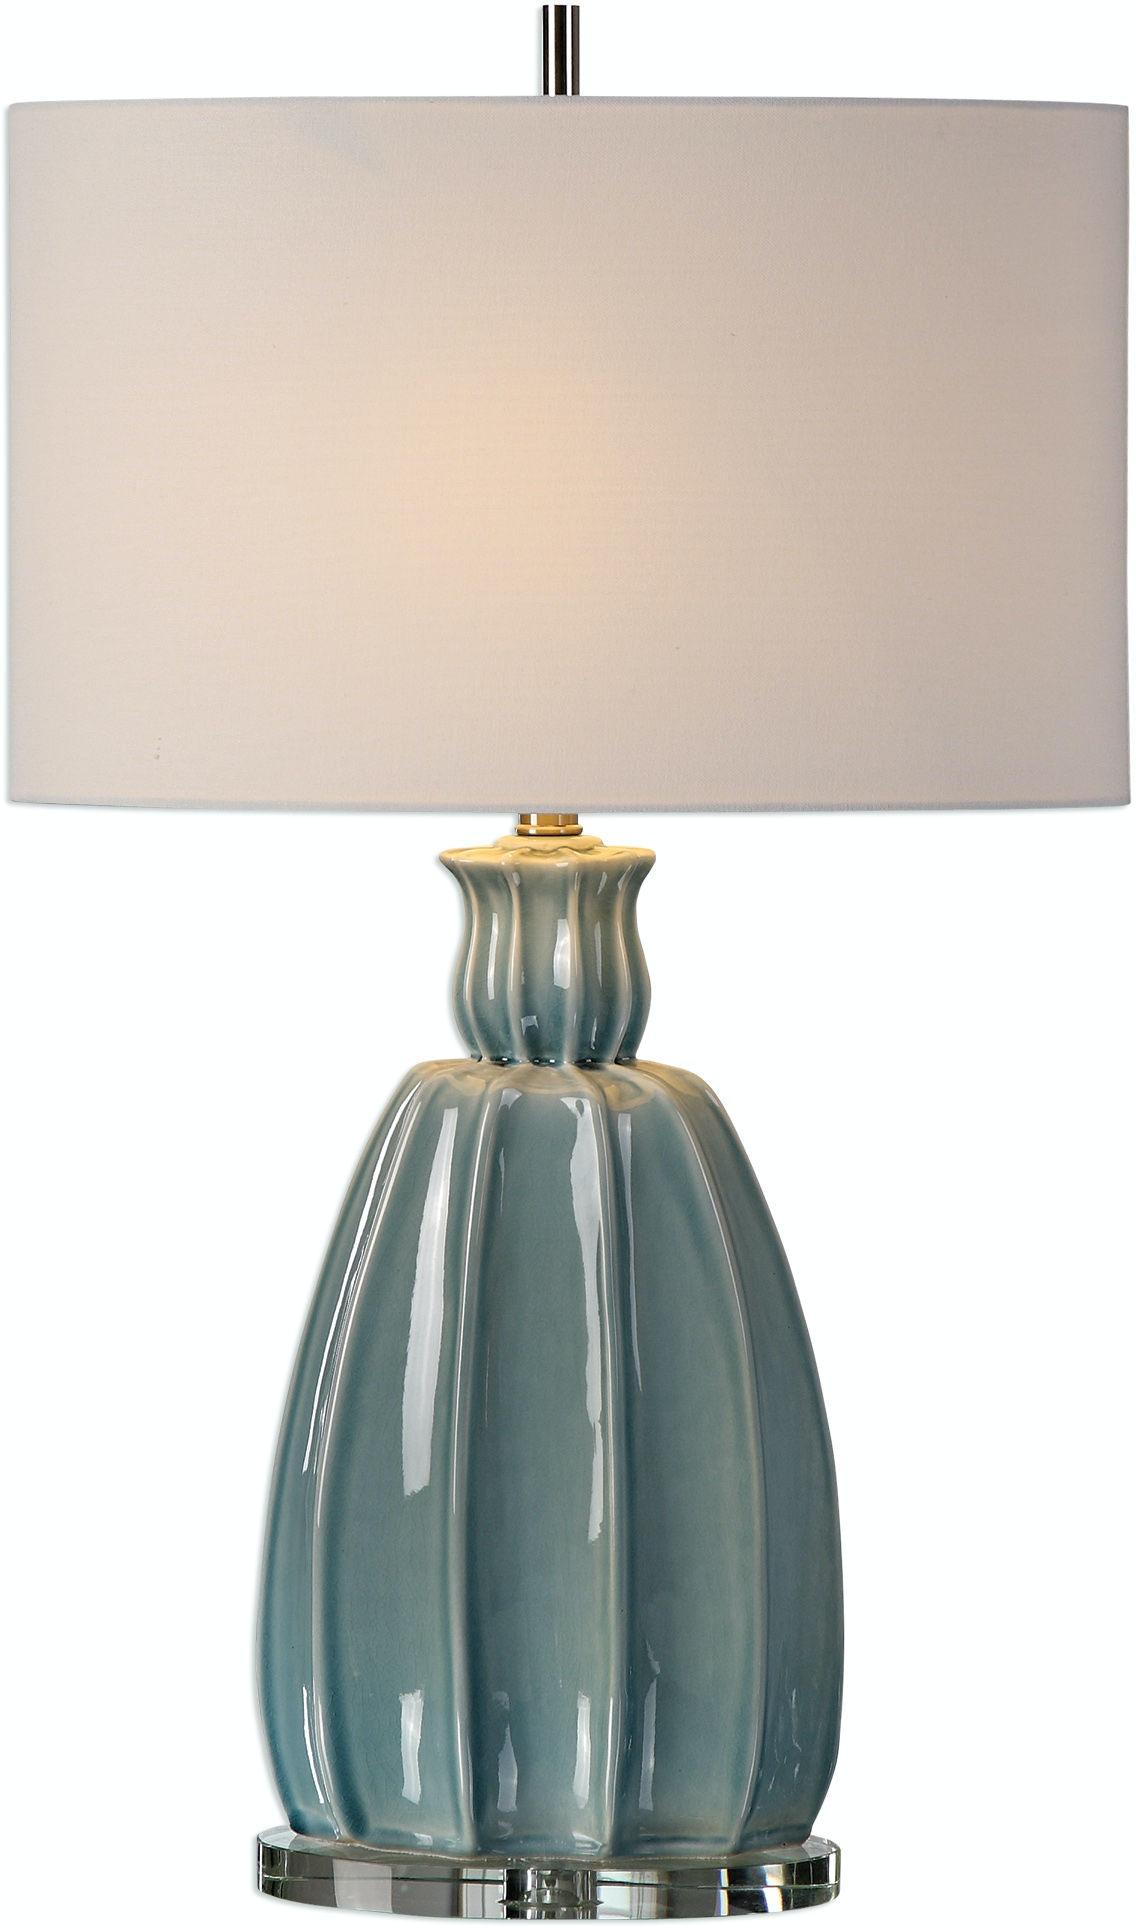 Uttermost suzanette sky blue ceramic lamp 27251